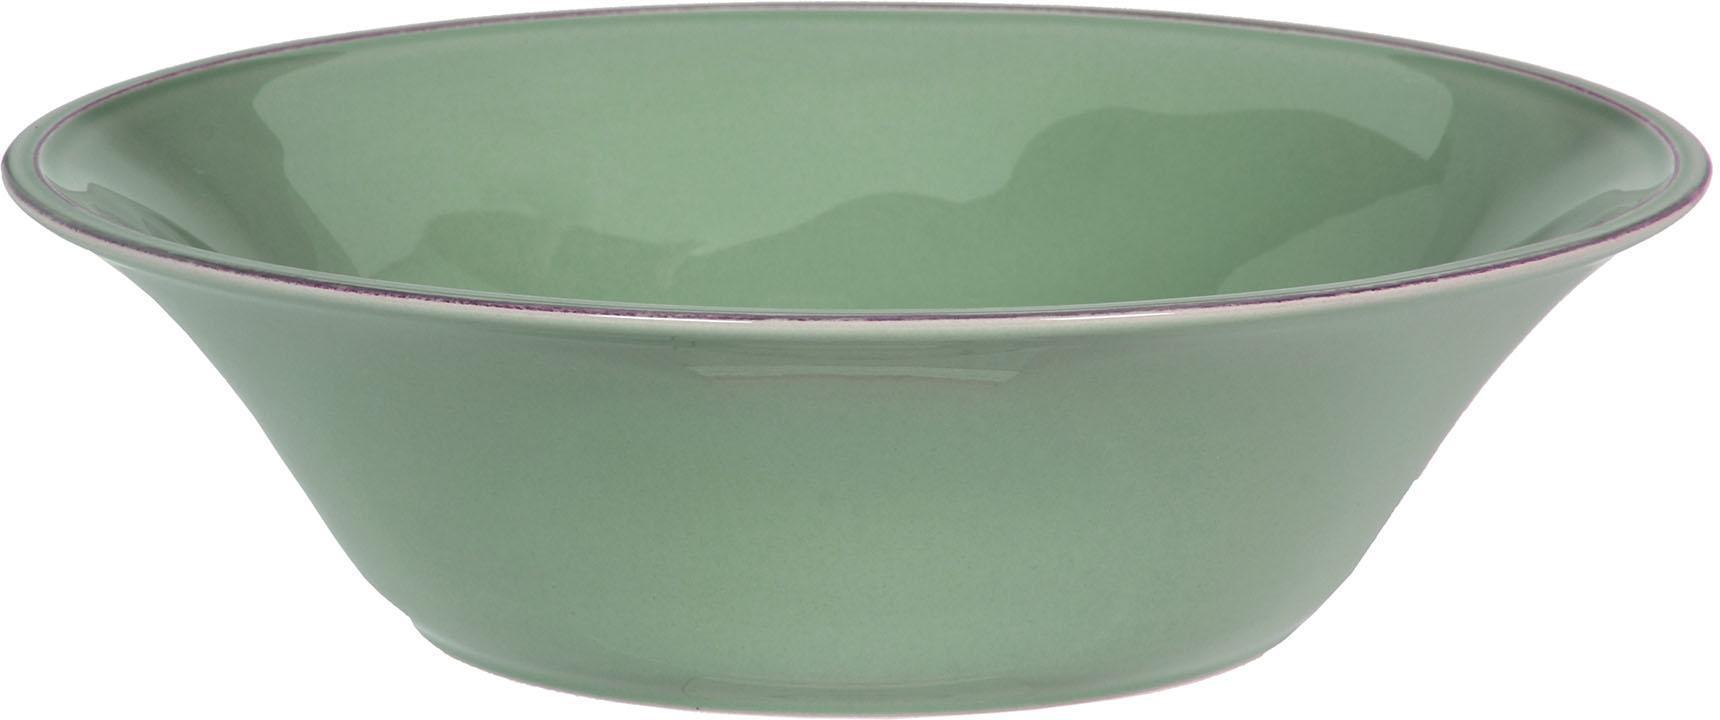 Insalatiera verde salvia Costanza, Terracotta, Verde salvia, Ø 30 x Alt. 9 cm